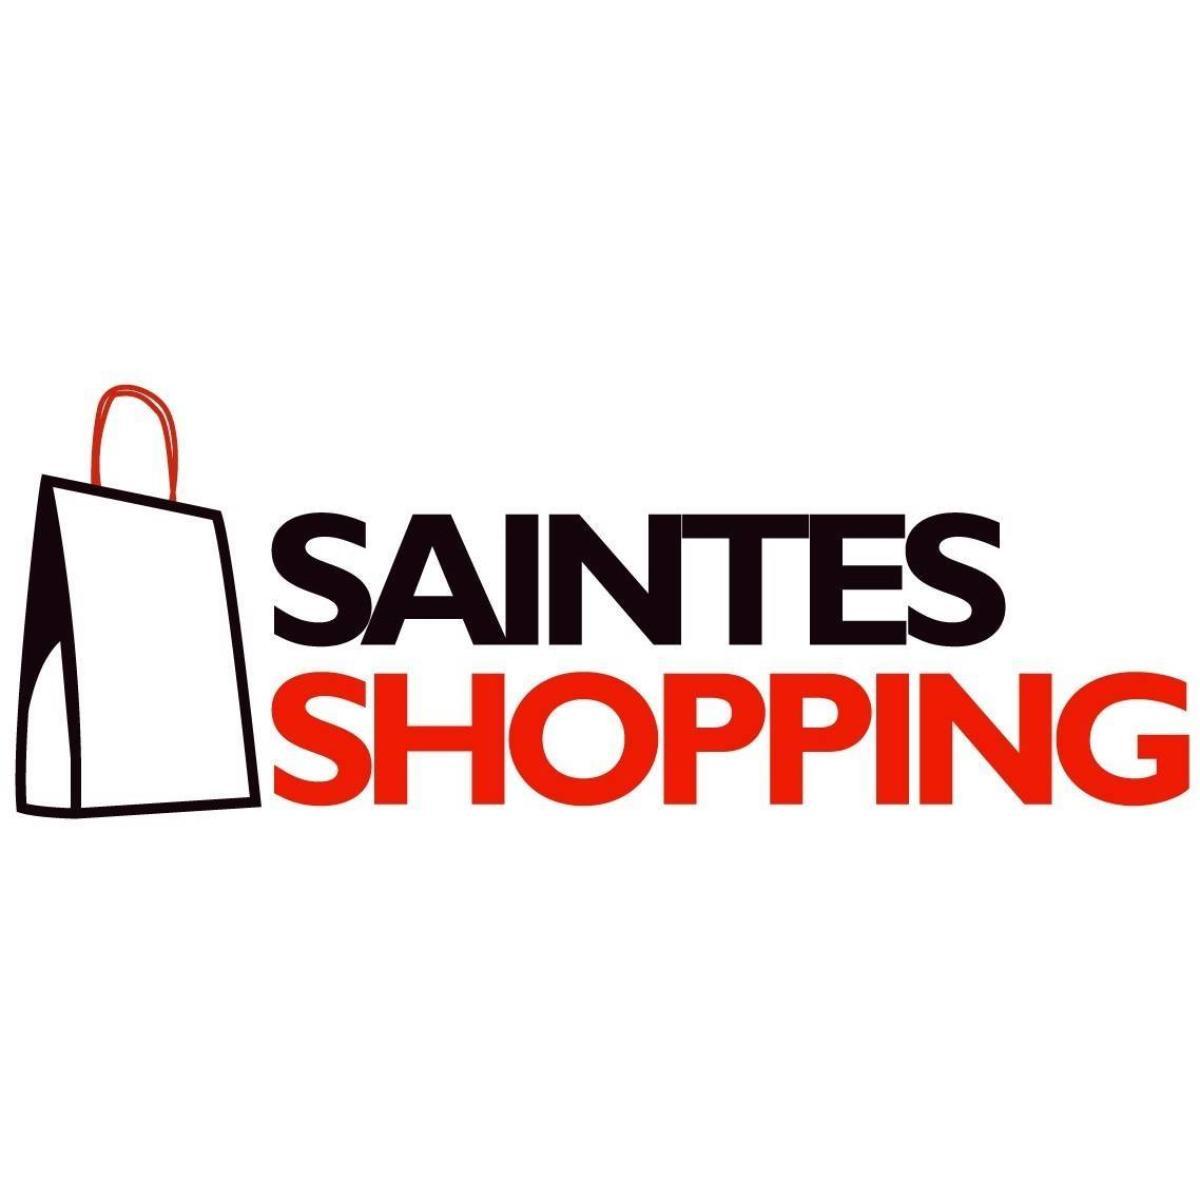 Saintes Shopping